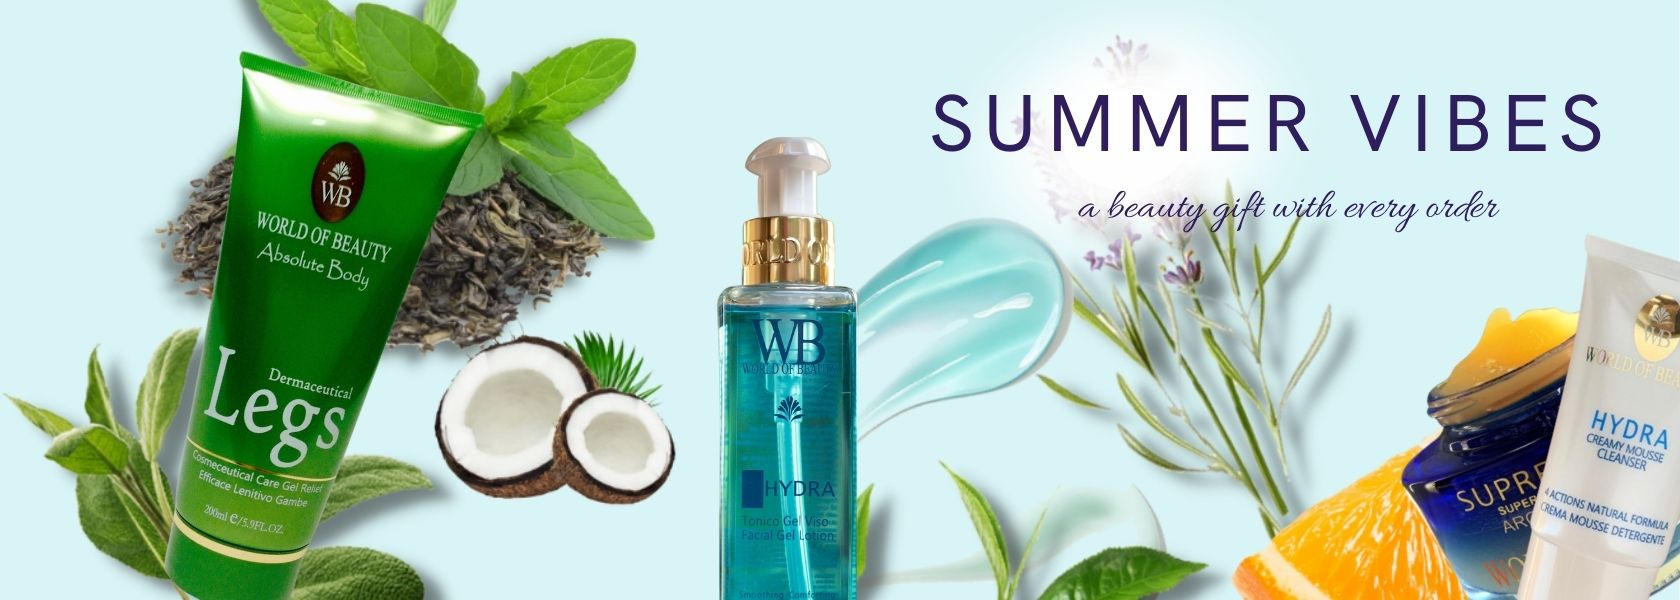 summer vibes beauty gift